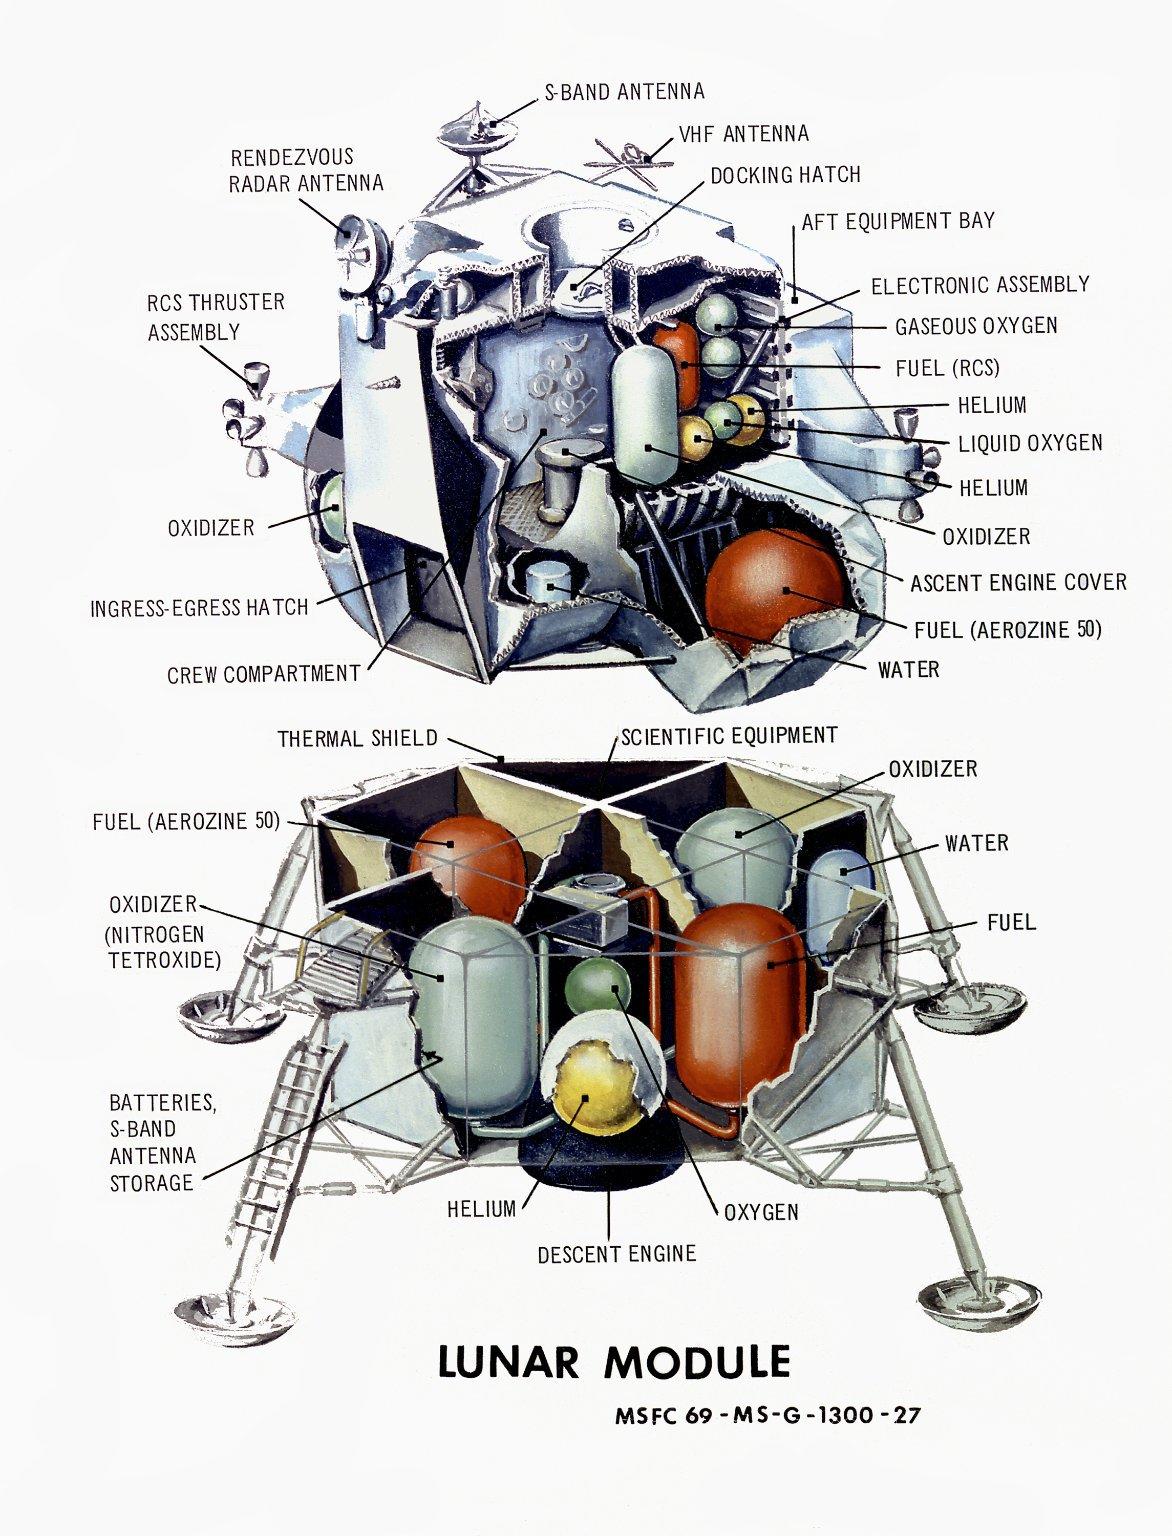 lunar landing module drawings - photo #22